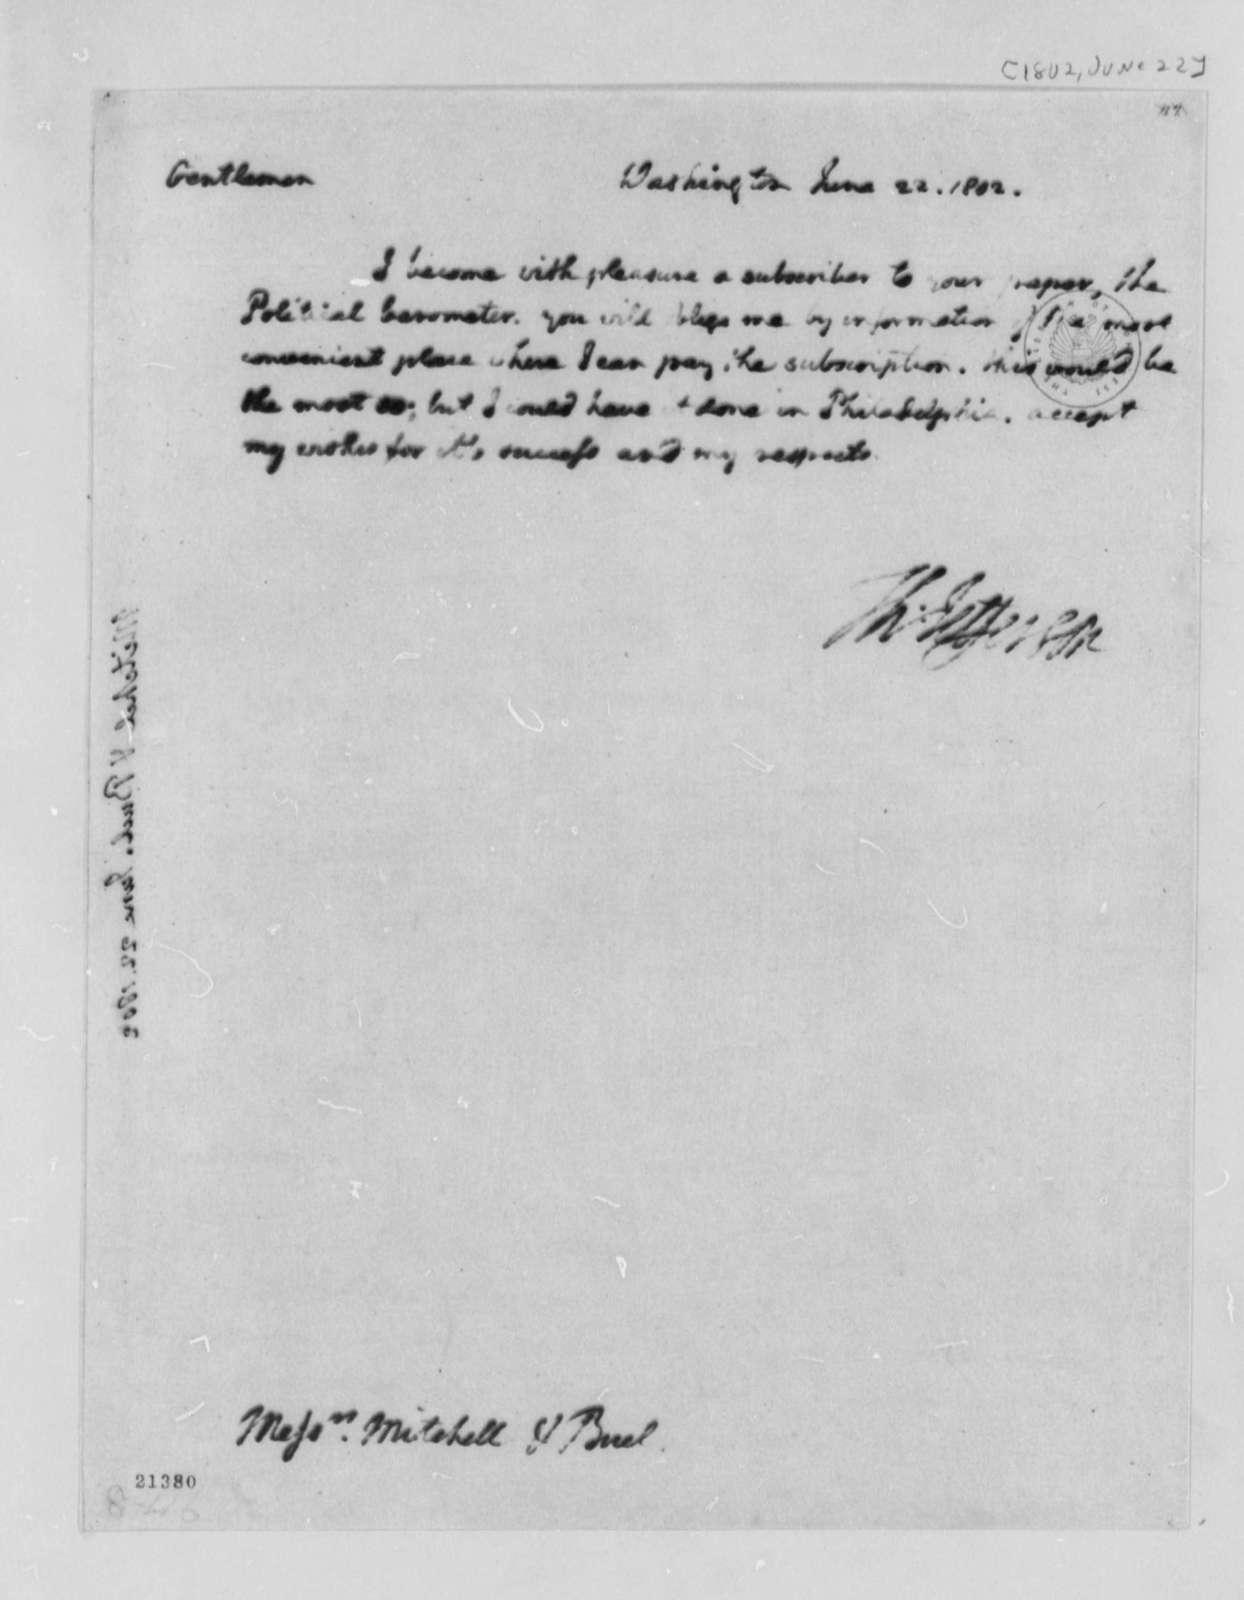 Thomas Jefferson to Mitchell & Buell, June 22, 1802